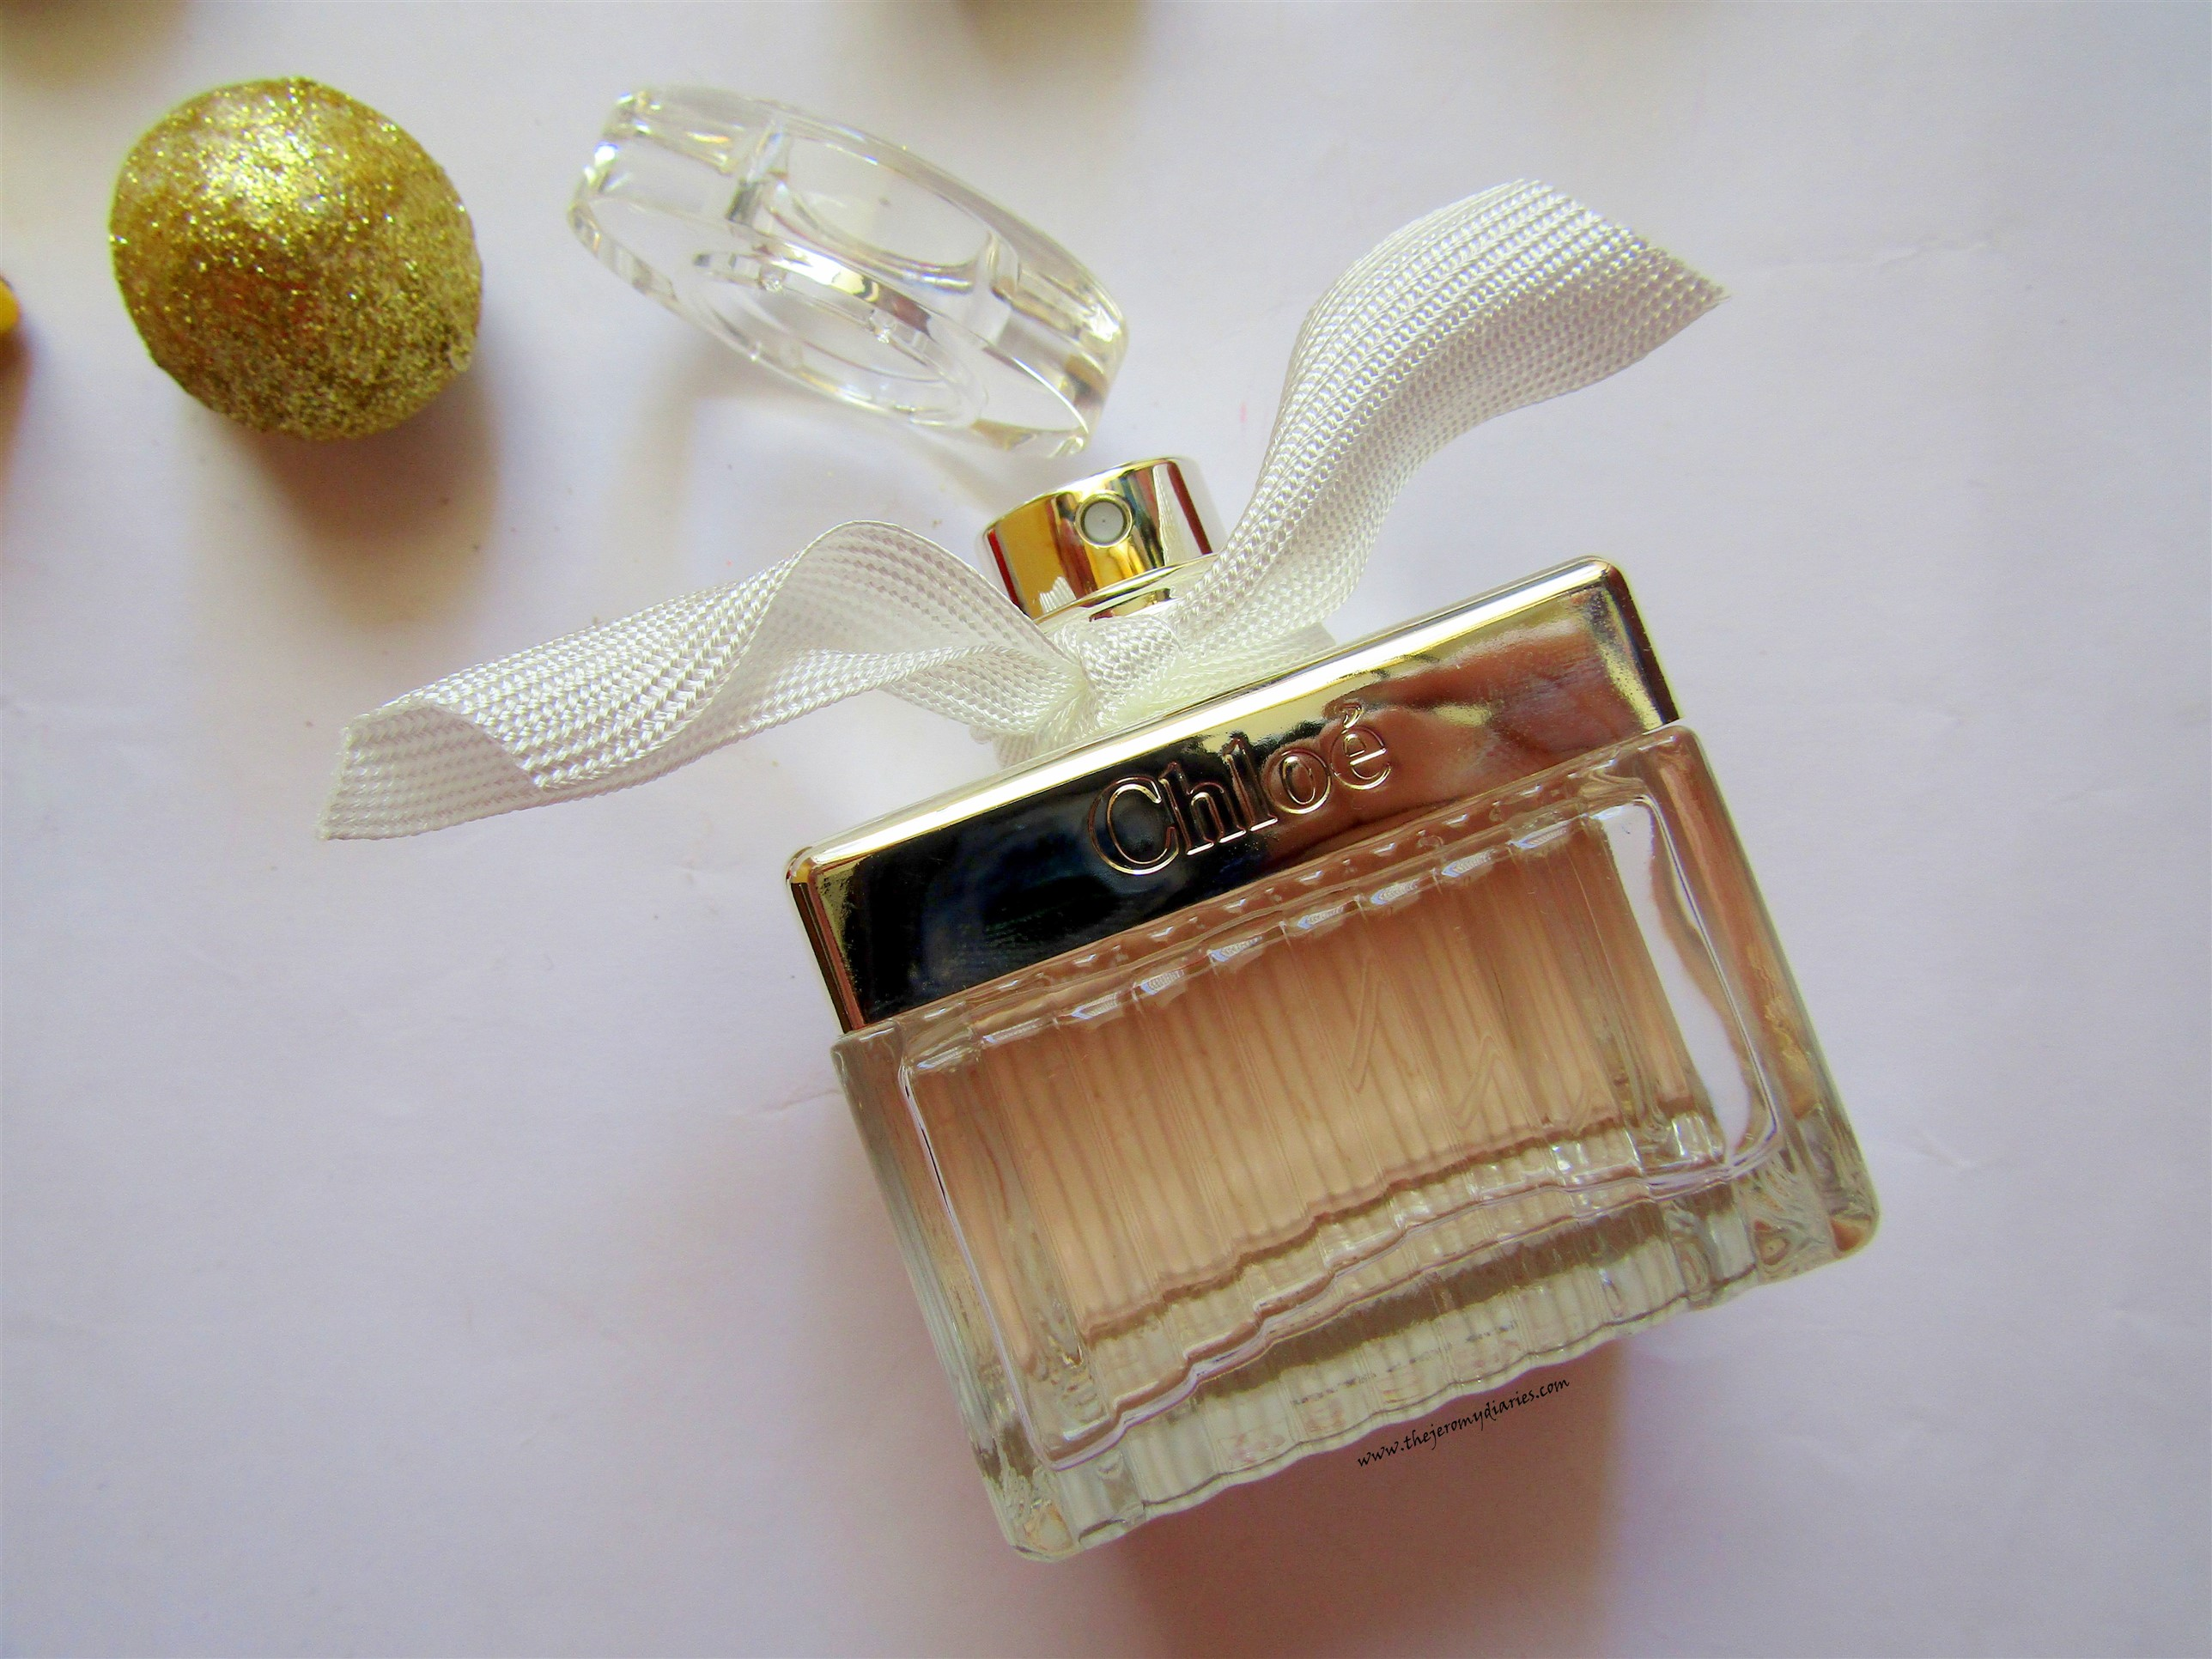 chloe x the jeromy diaries chloe perfumes